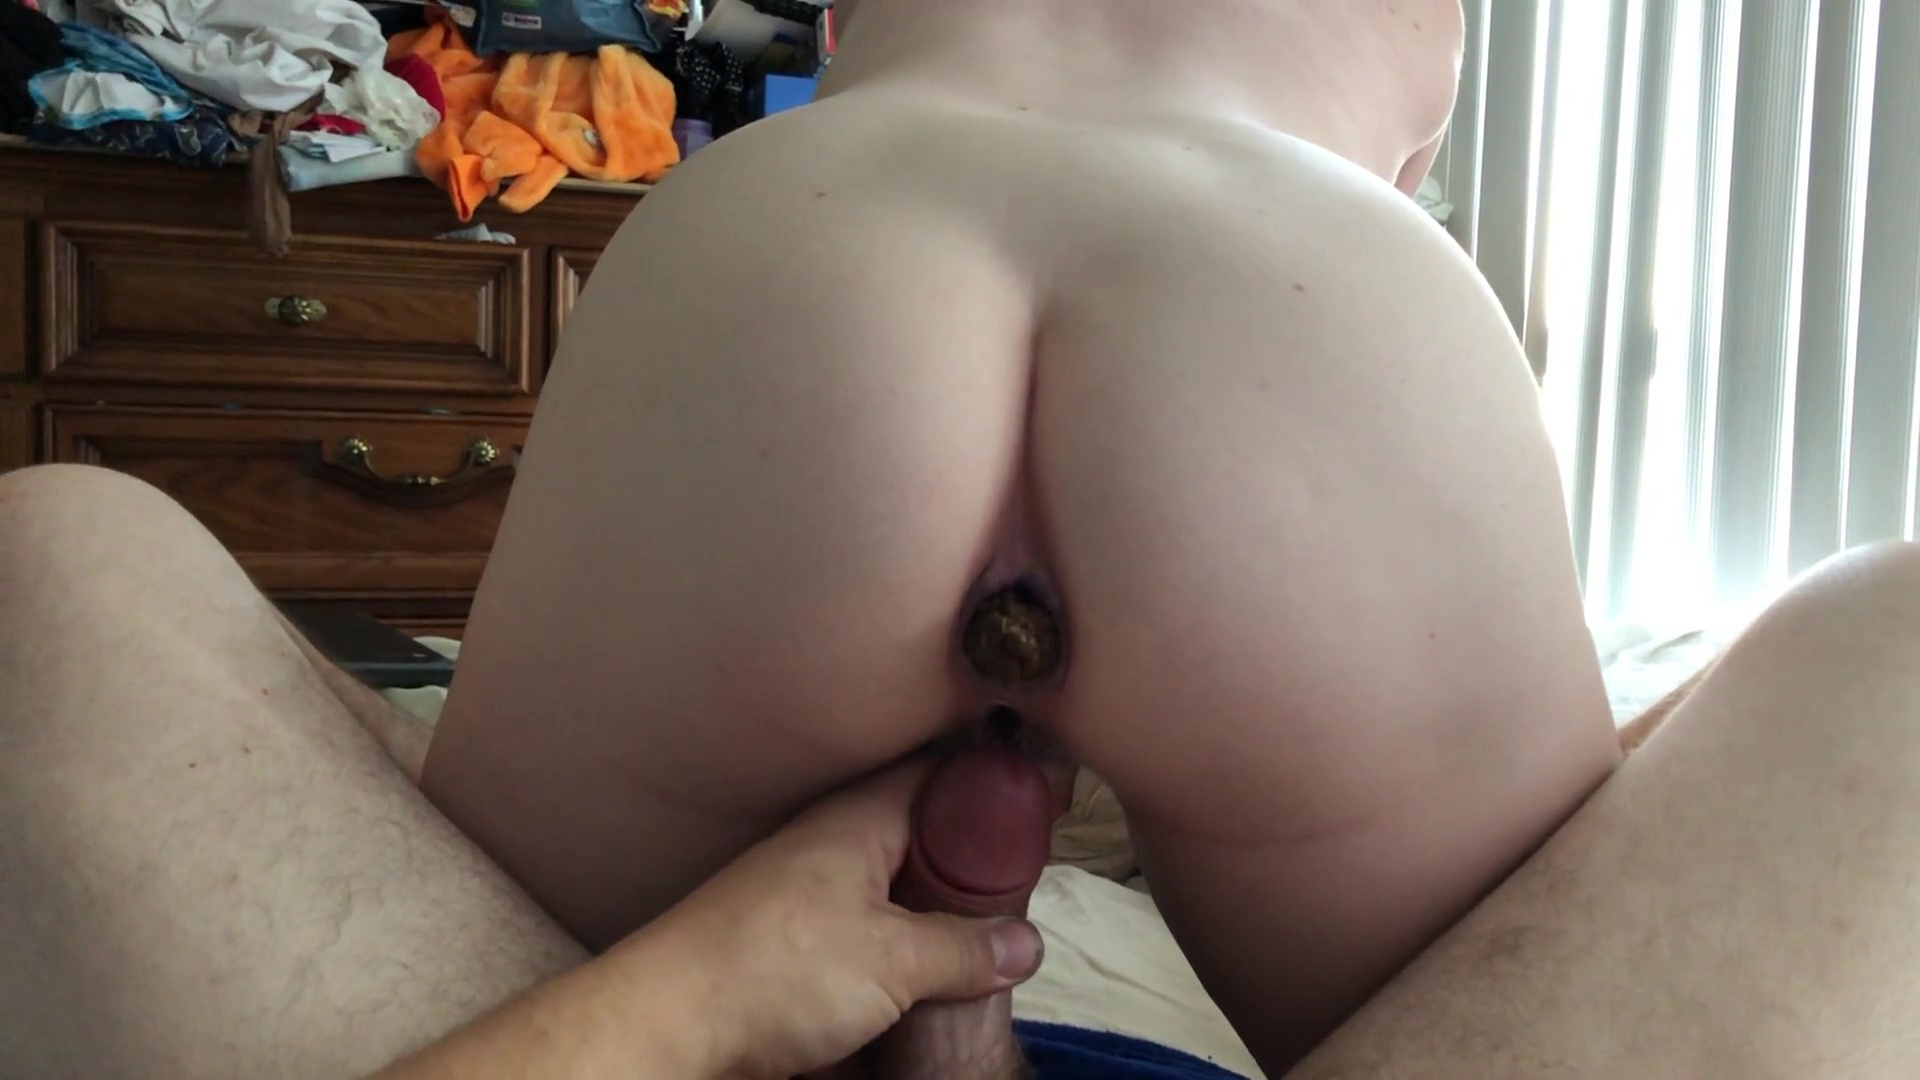 amateurcouplewithfriends769 - Scat sex 31